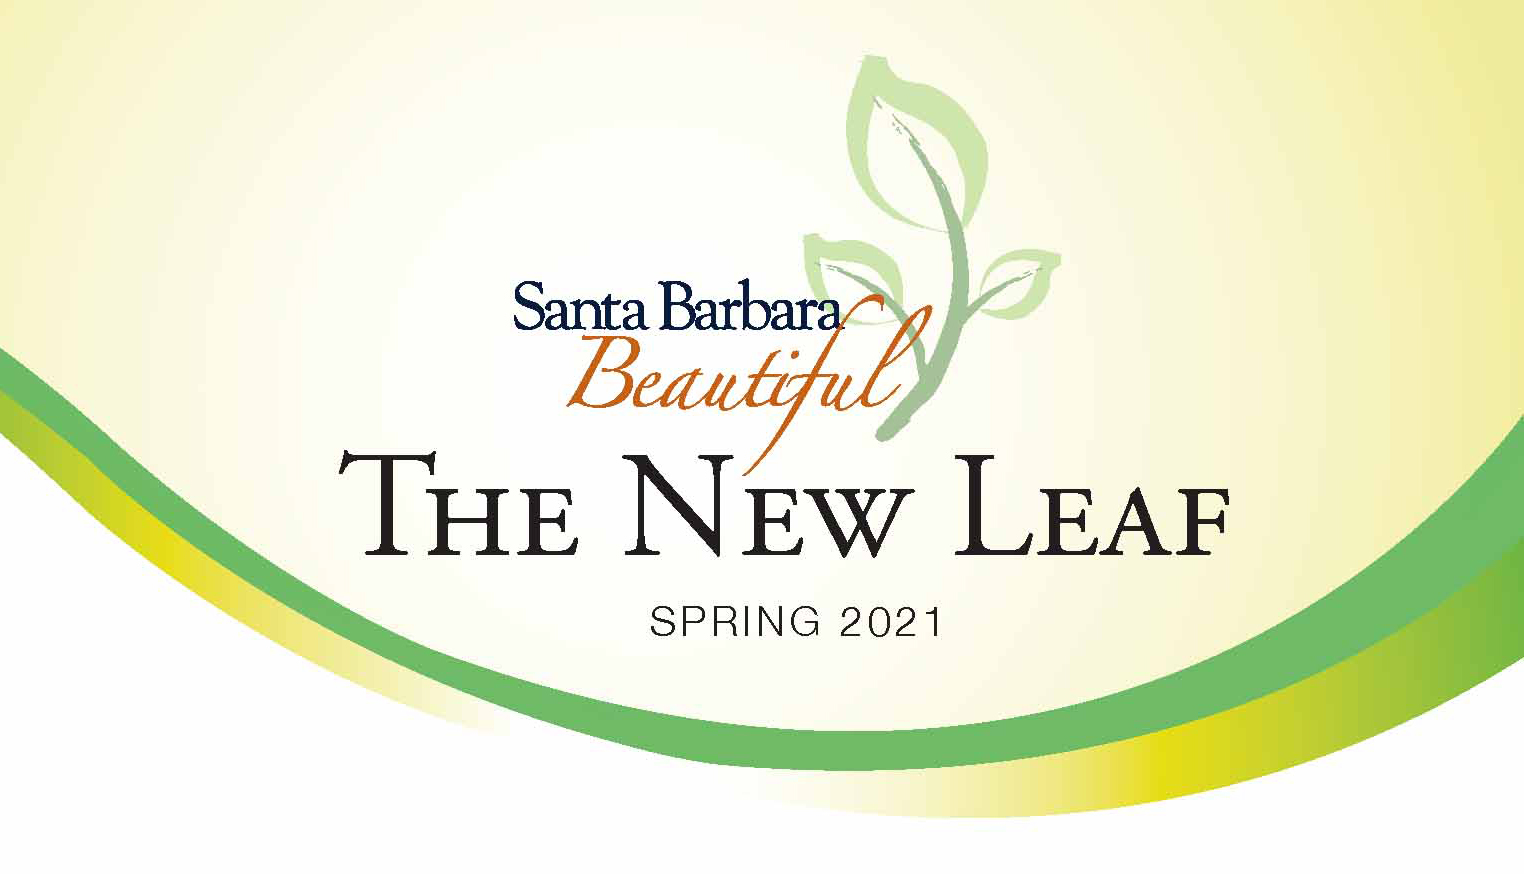 The New Leaf Newsletter Santa Barbara Beautiful